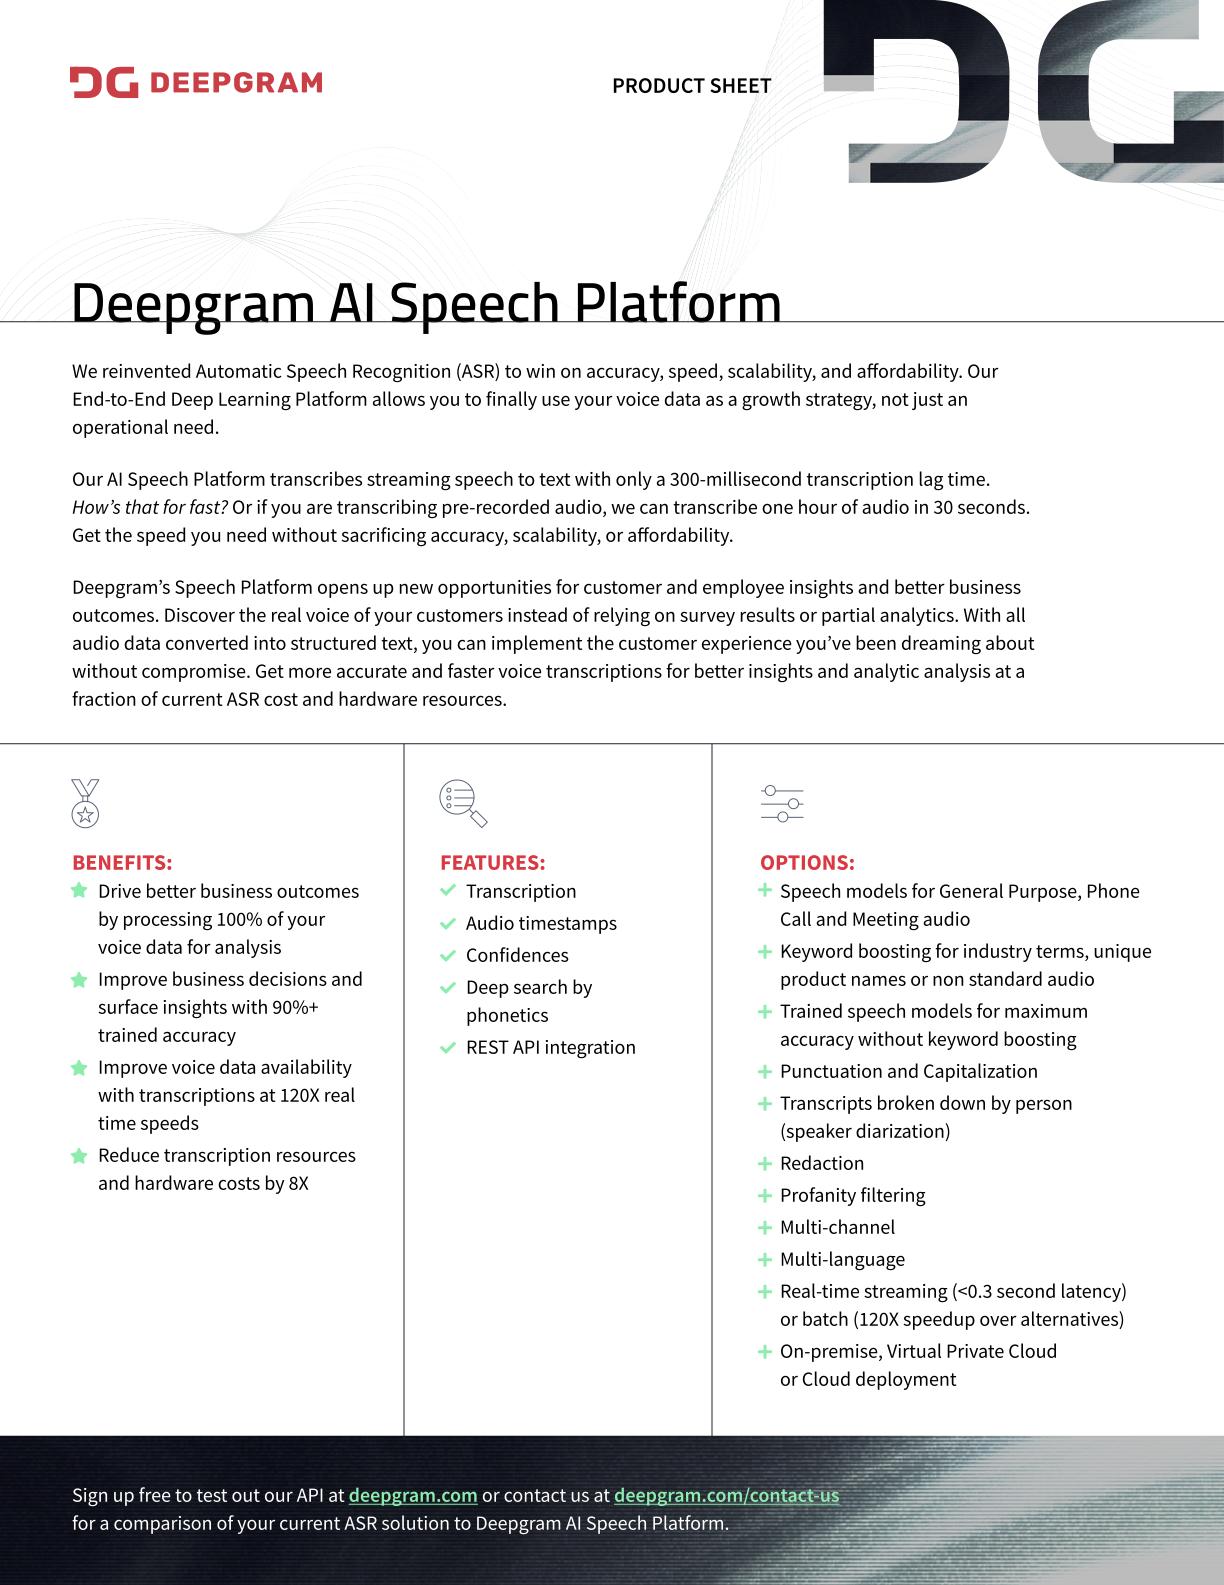 product-sheets-deepgram-platform-20210316 copy